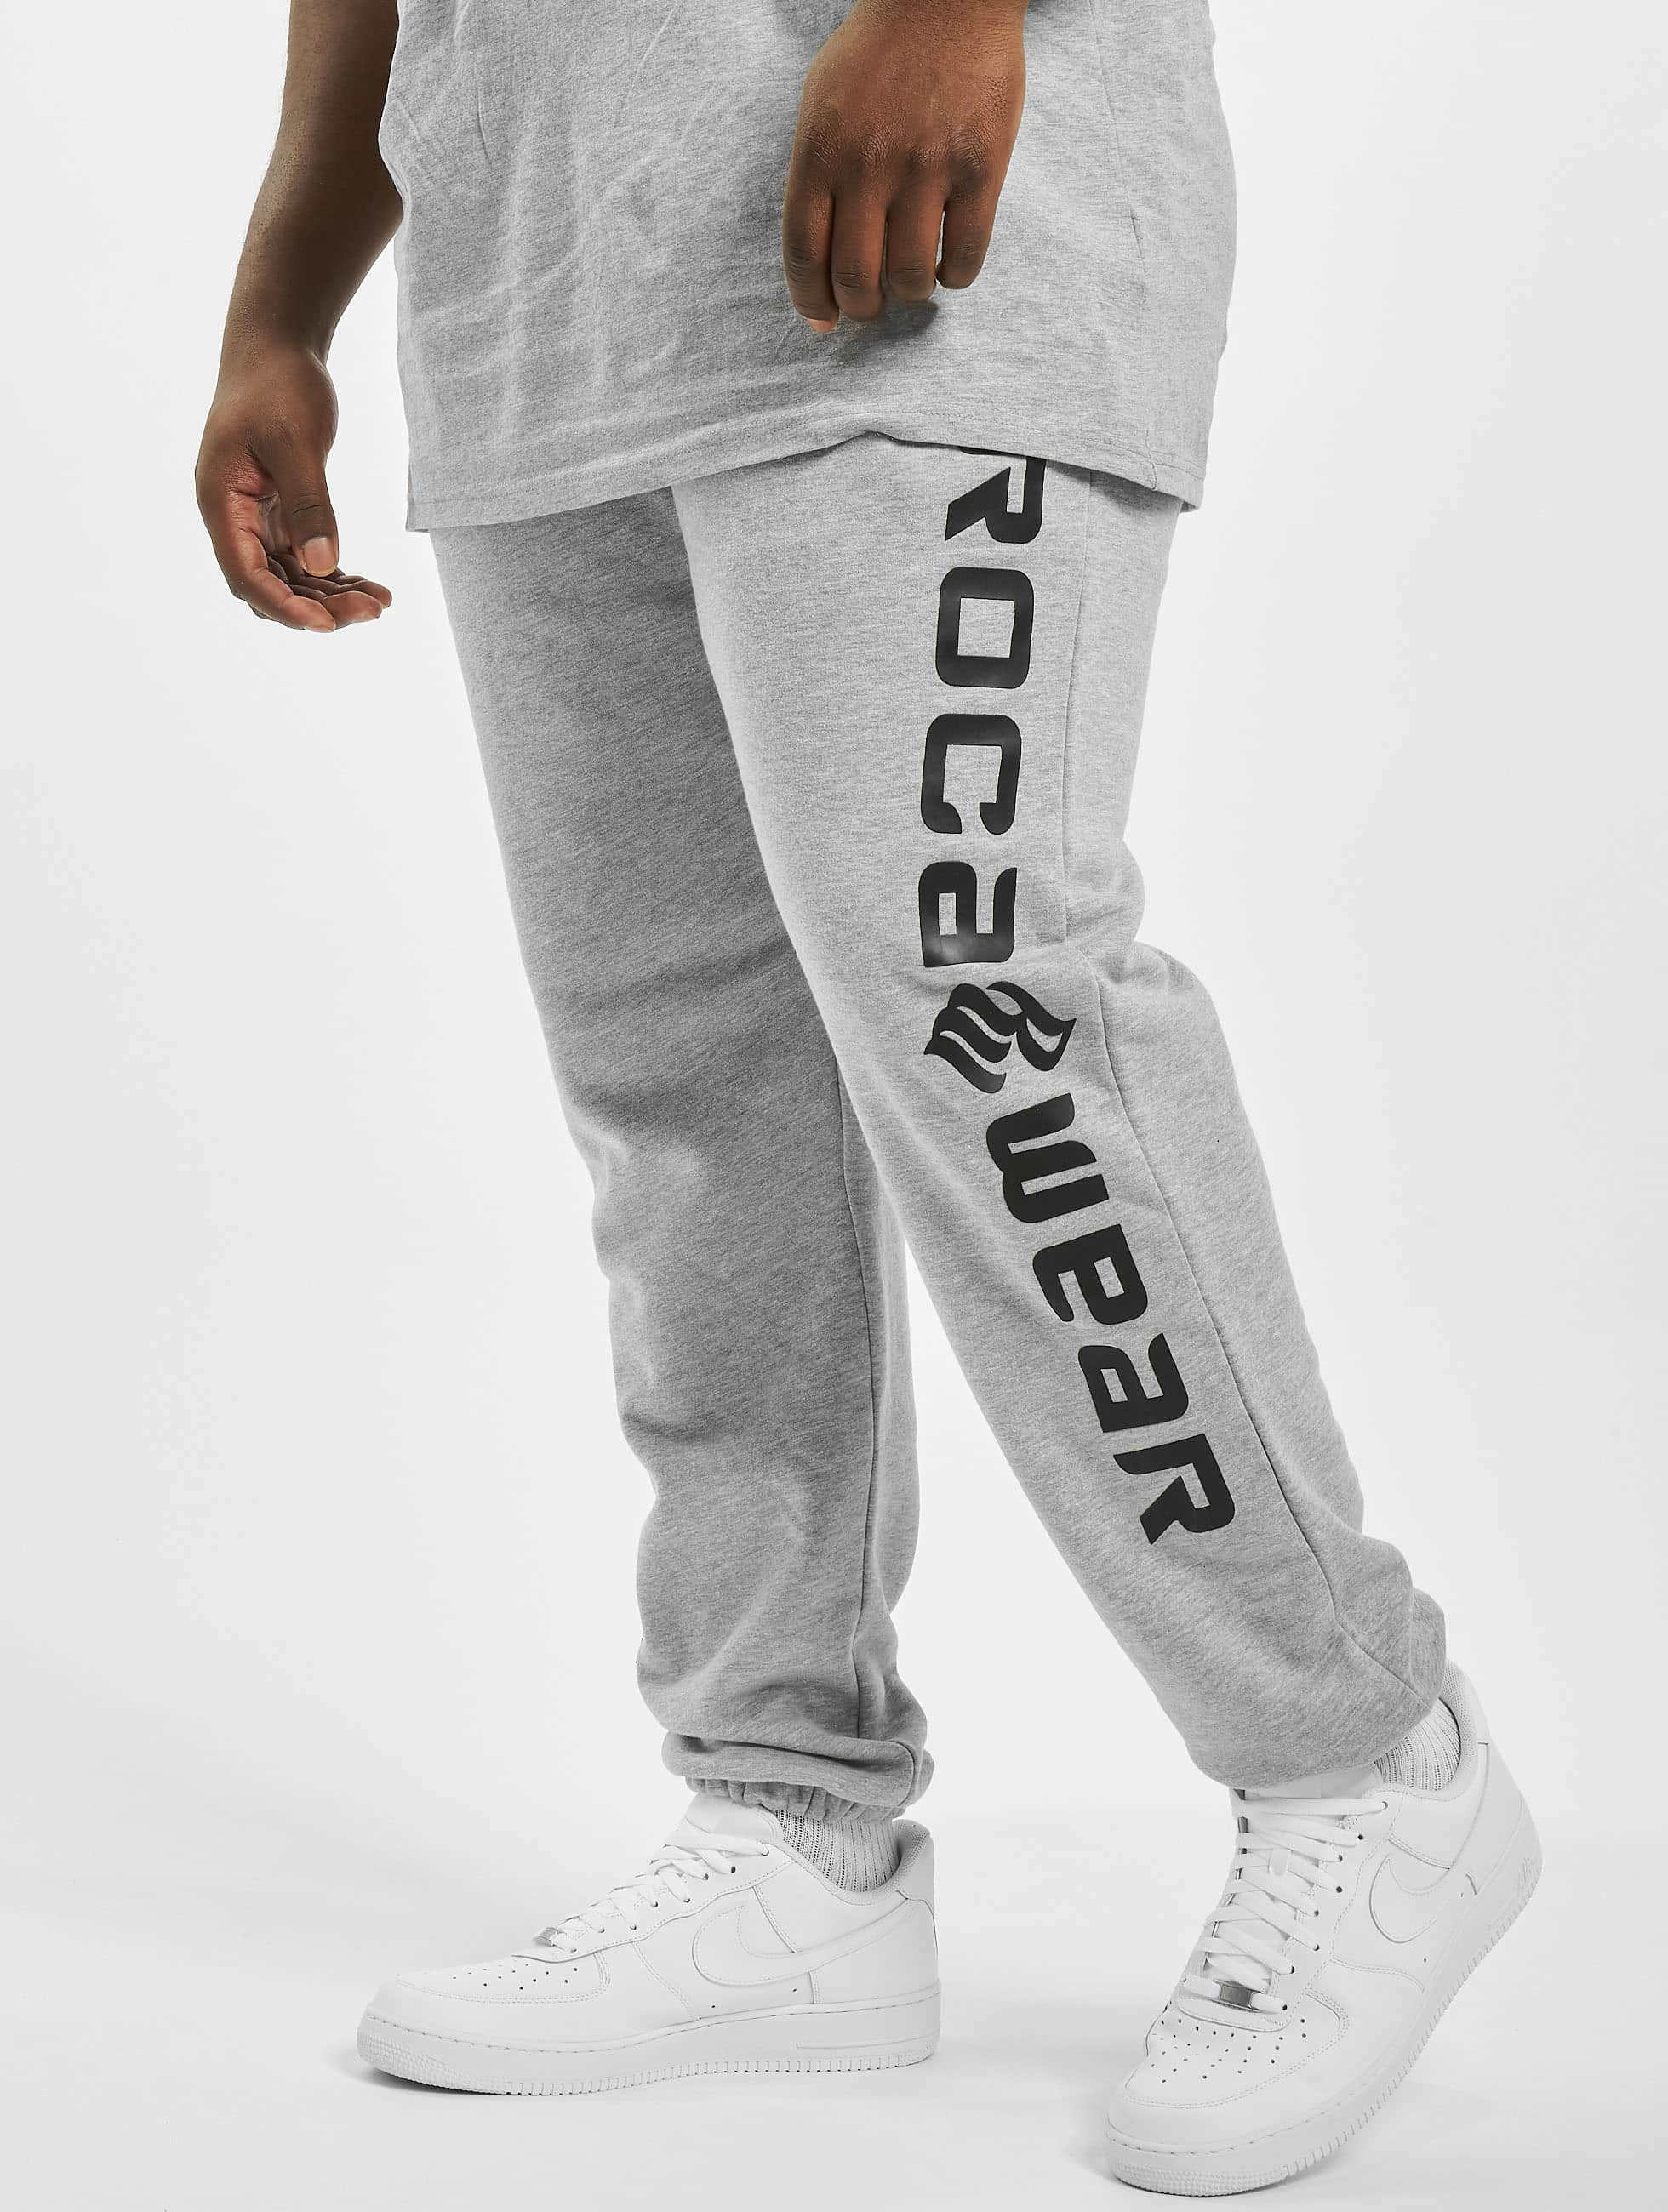 Rocawear / Sweat Pant Big Basic Fleece in grey 8XL